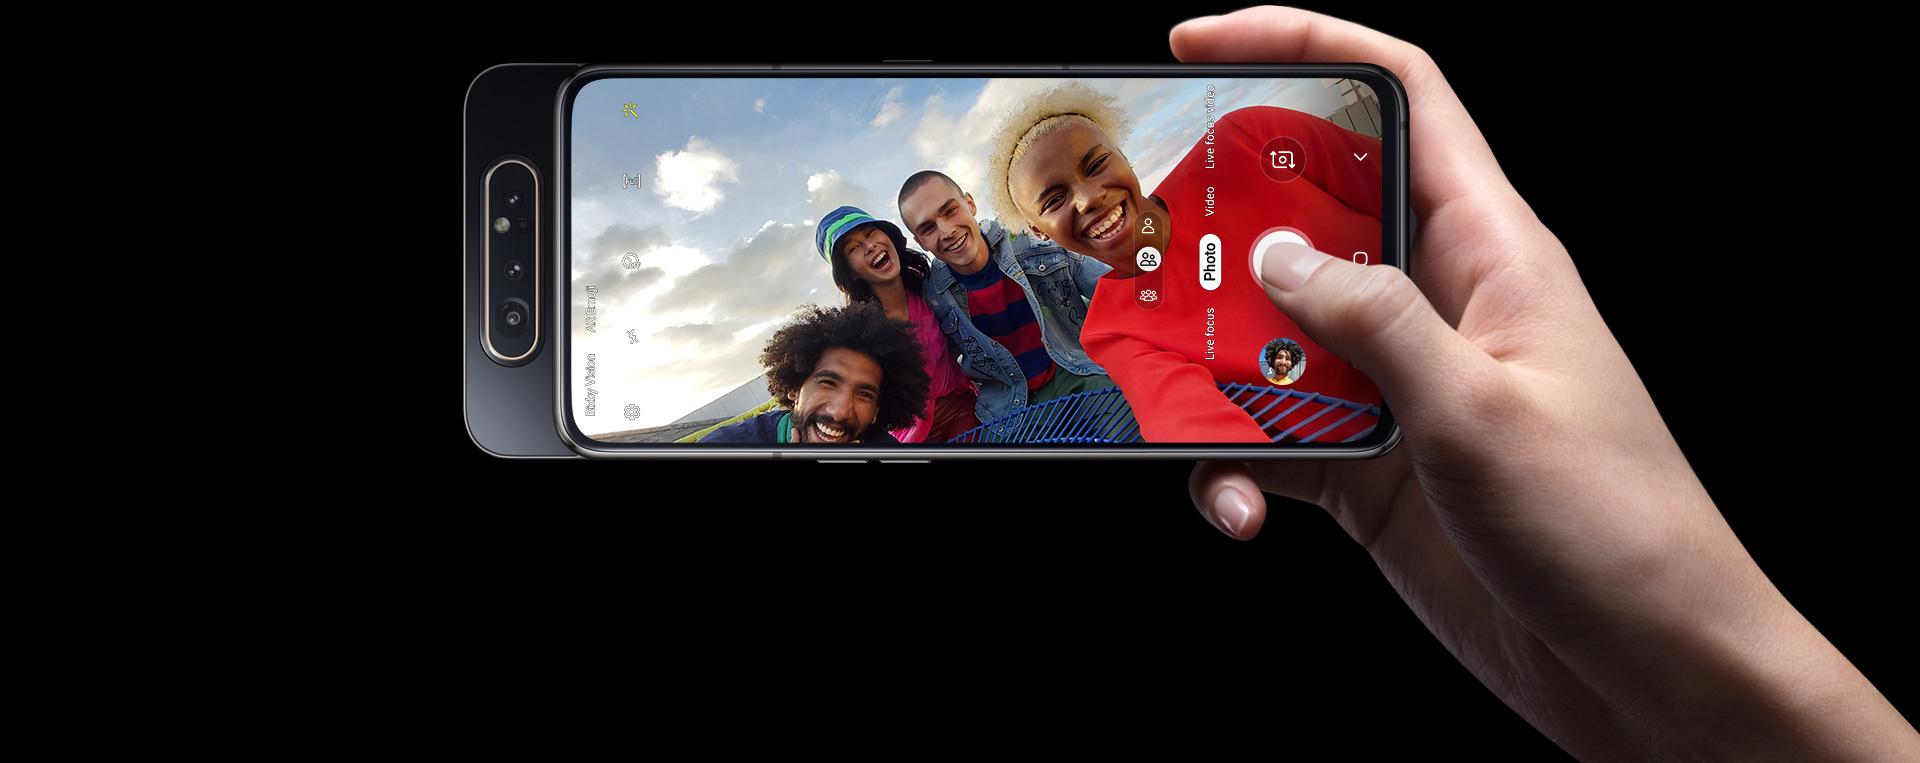 Samsung Galaxy A80 Dual SIM (SM-A805) kártyafüggetlen okostelefon, Black (Android) 02